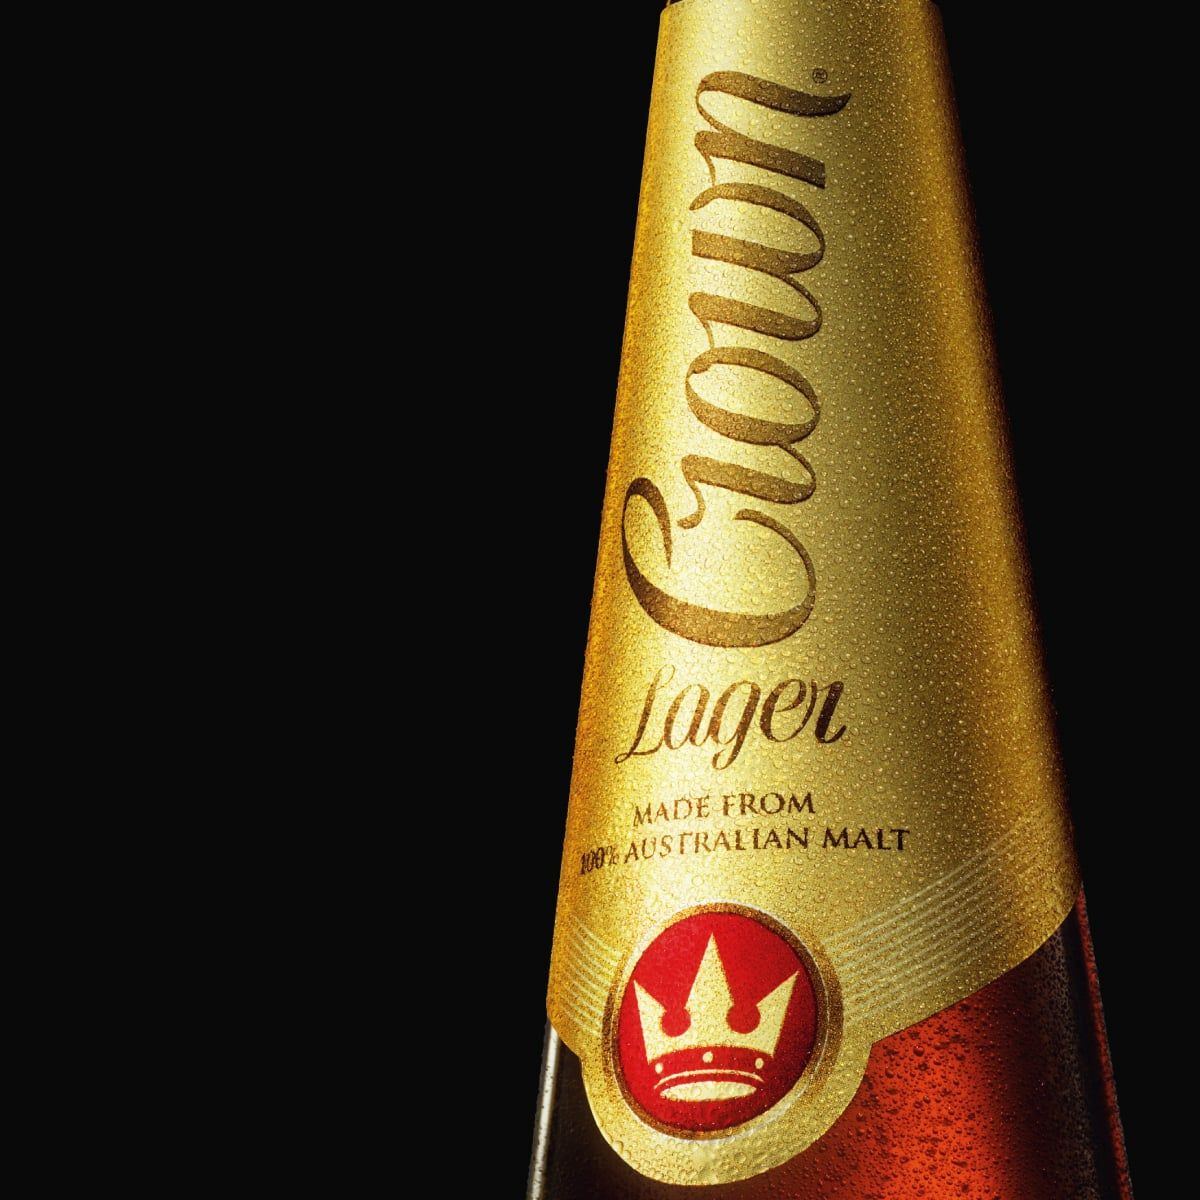 Davidson Branding FMCG Crown Lager Carlton United Breweries Packaging Bottle Design